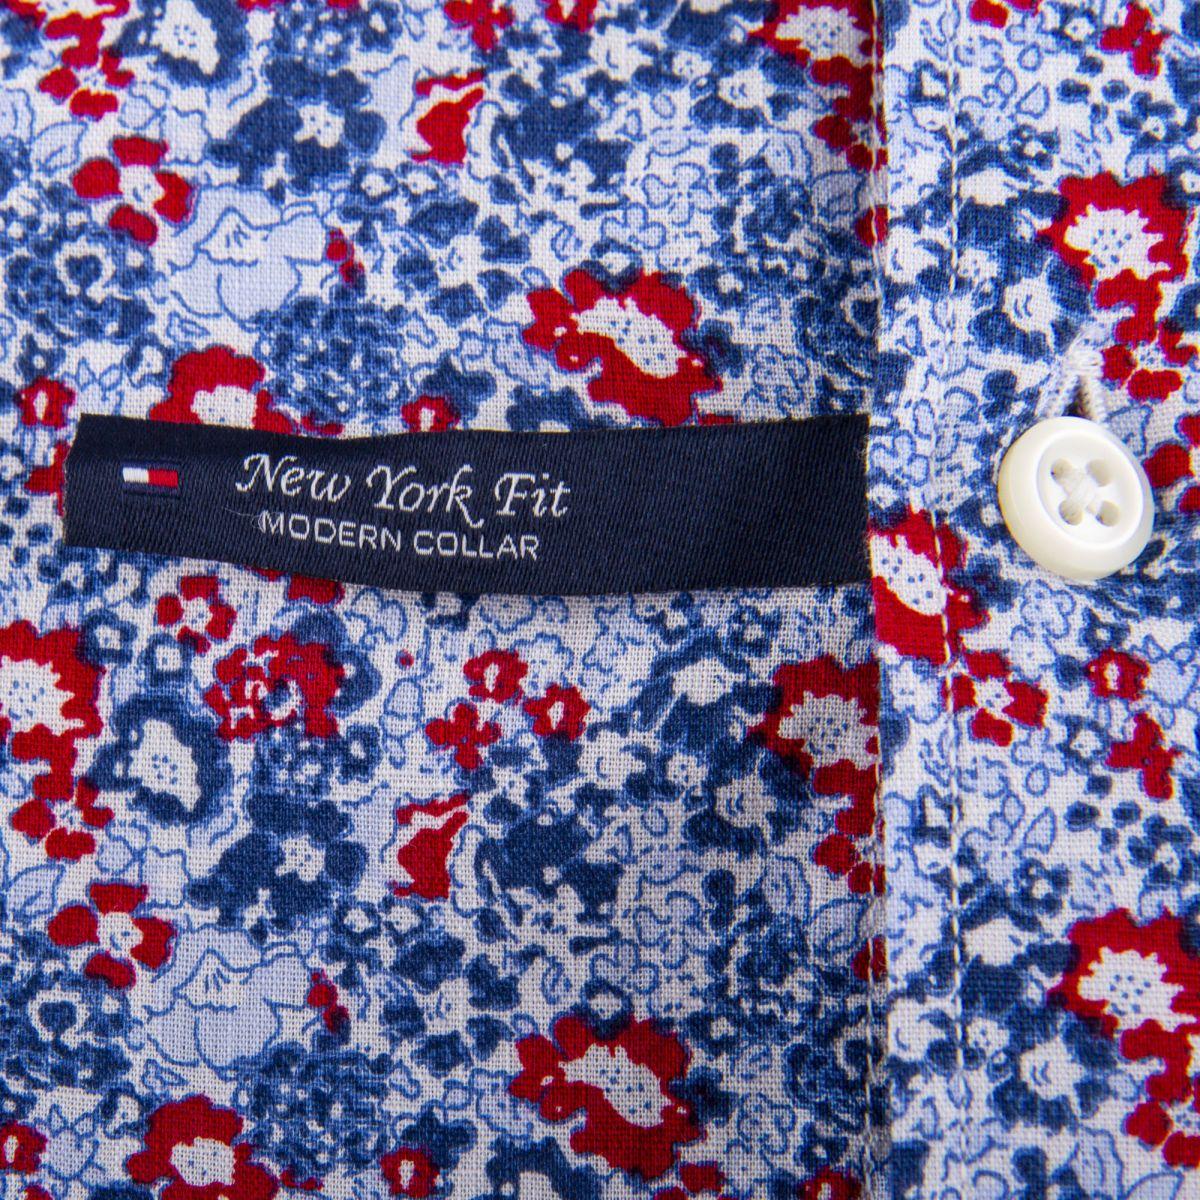 chemise bleu et rouge imprim u00e9 fleuri homme tommy hilfiger